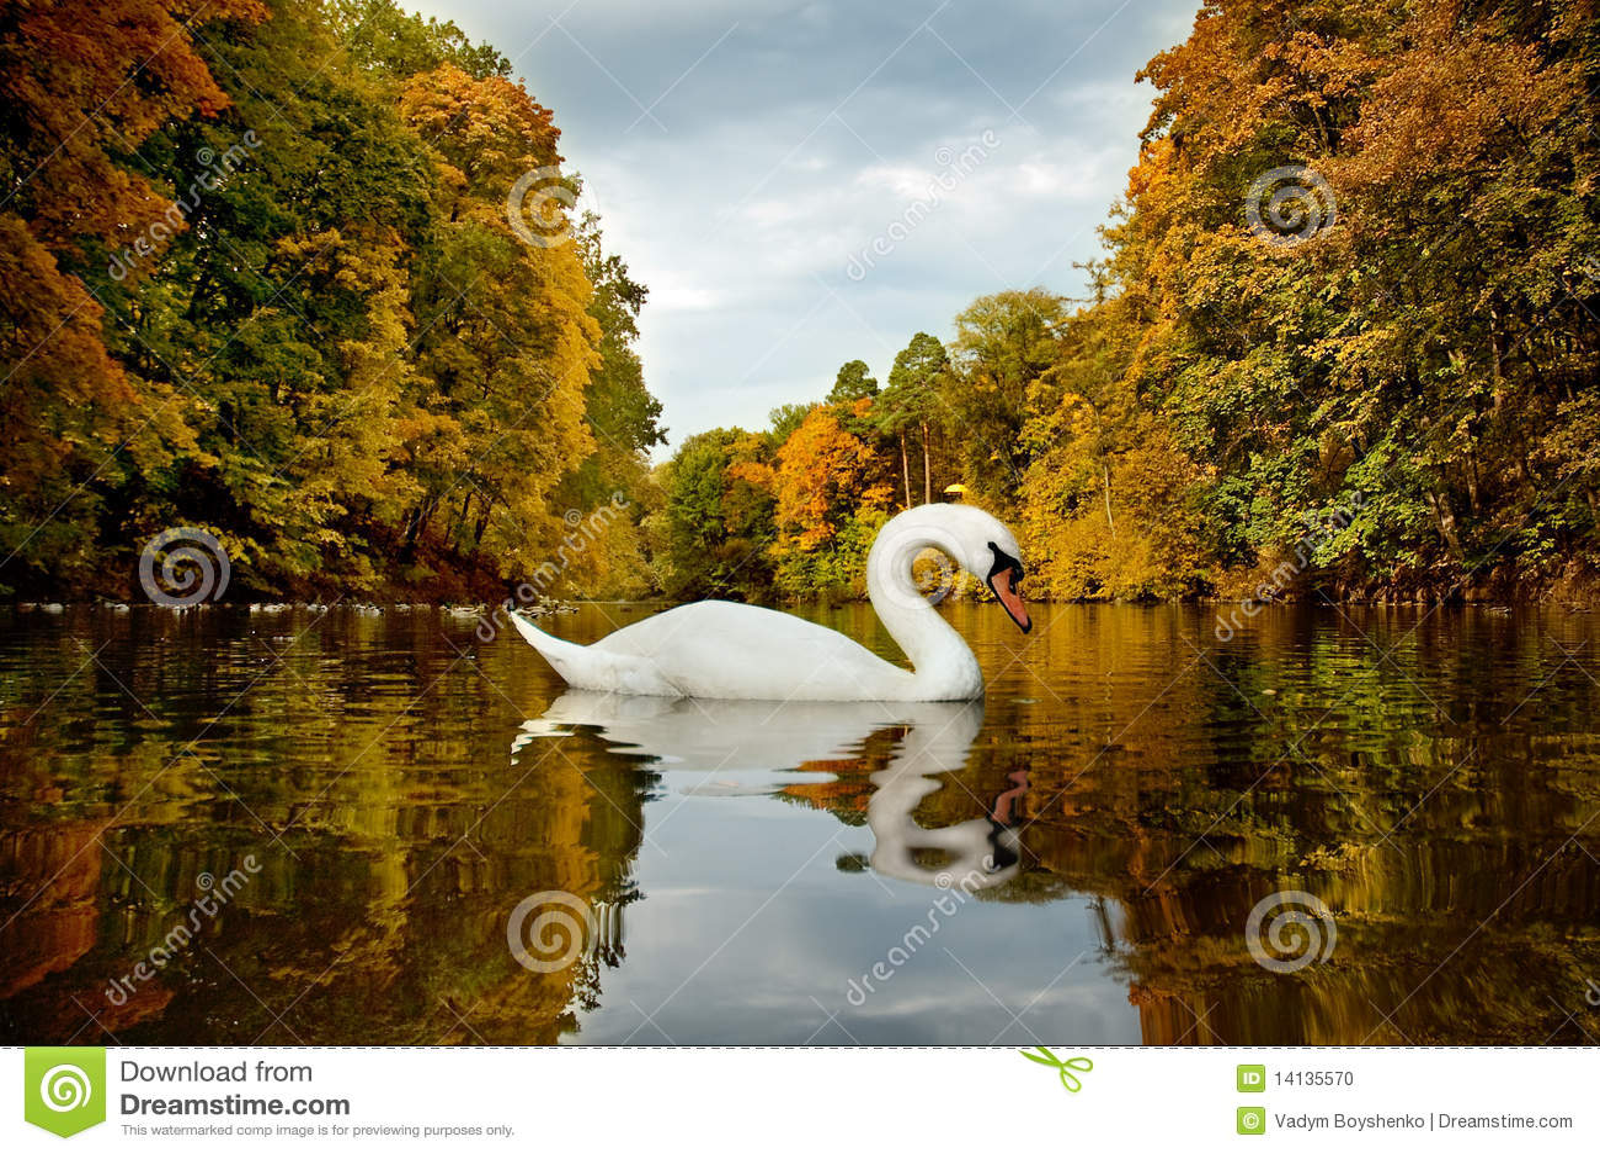 swan alexandria